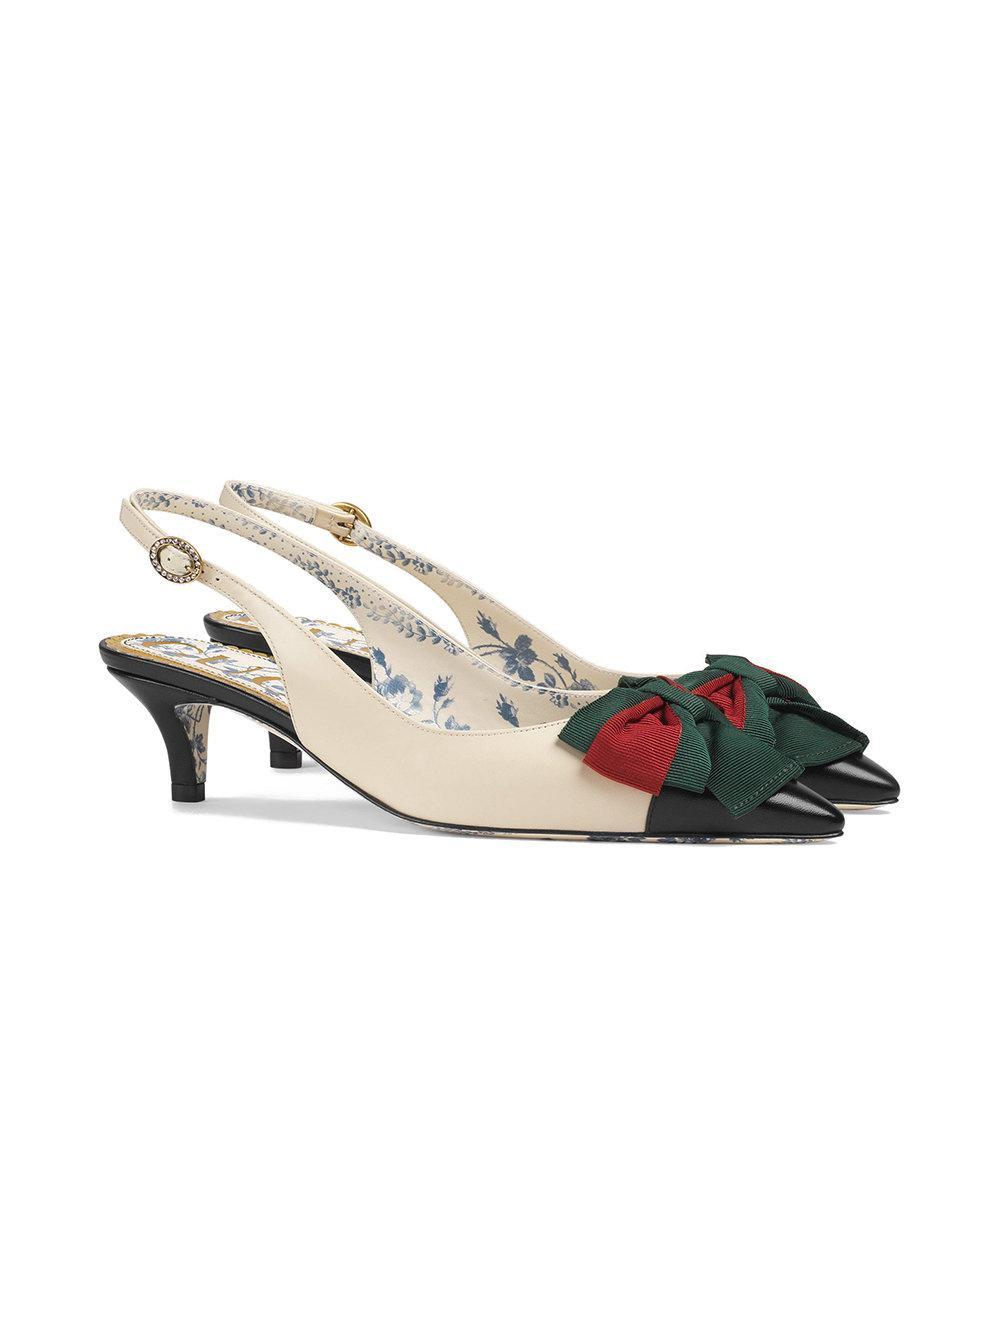 Gucci Pompe Cuir Bride Arrière Avec Nœud Web - Blanc VRkn2qAad